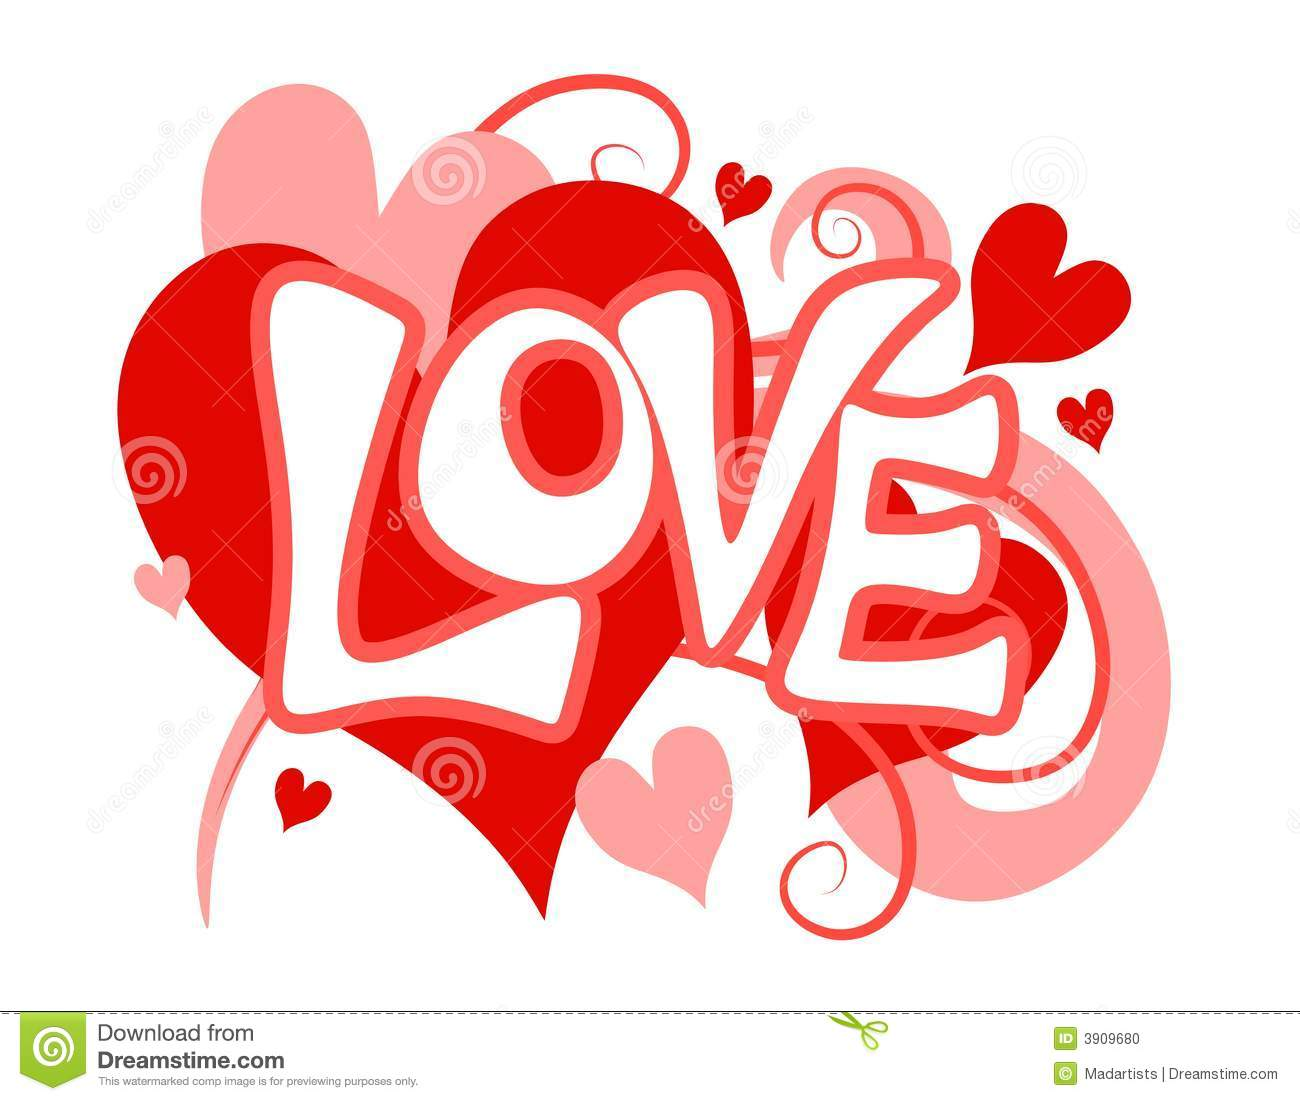 Love hearts clipart svg Valentine's Day Love Heart Clip Art Stock Photo - Image: 3909680 svg